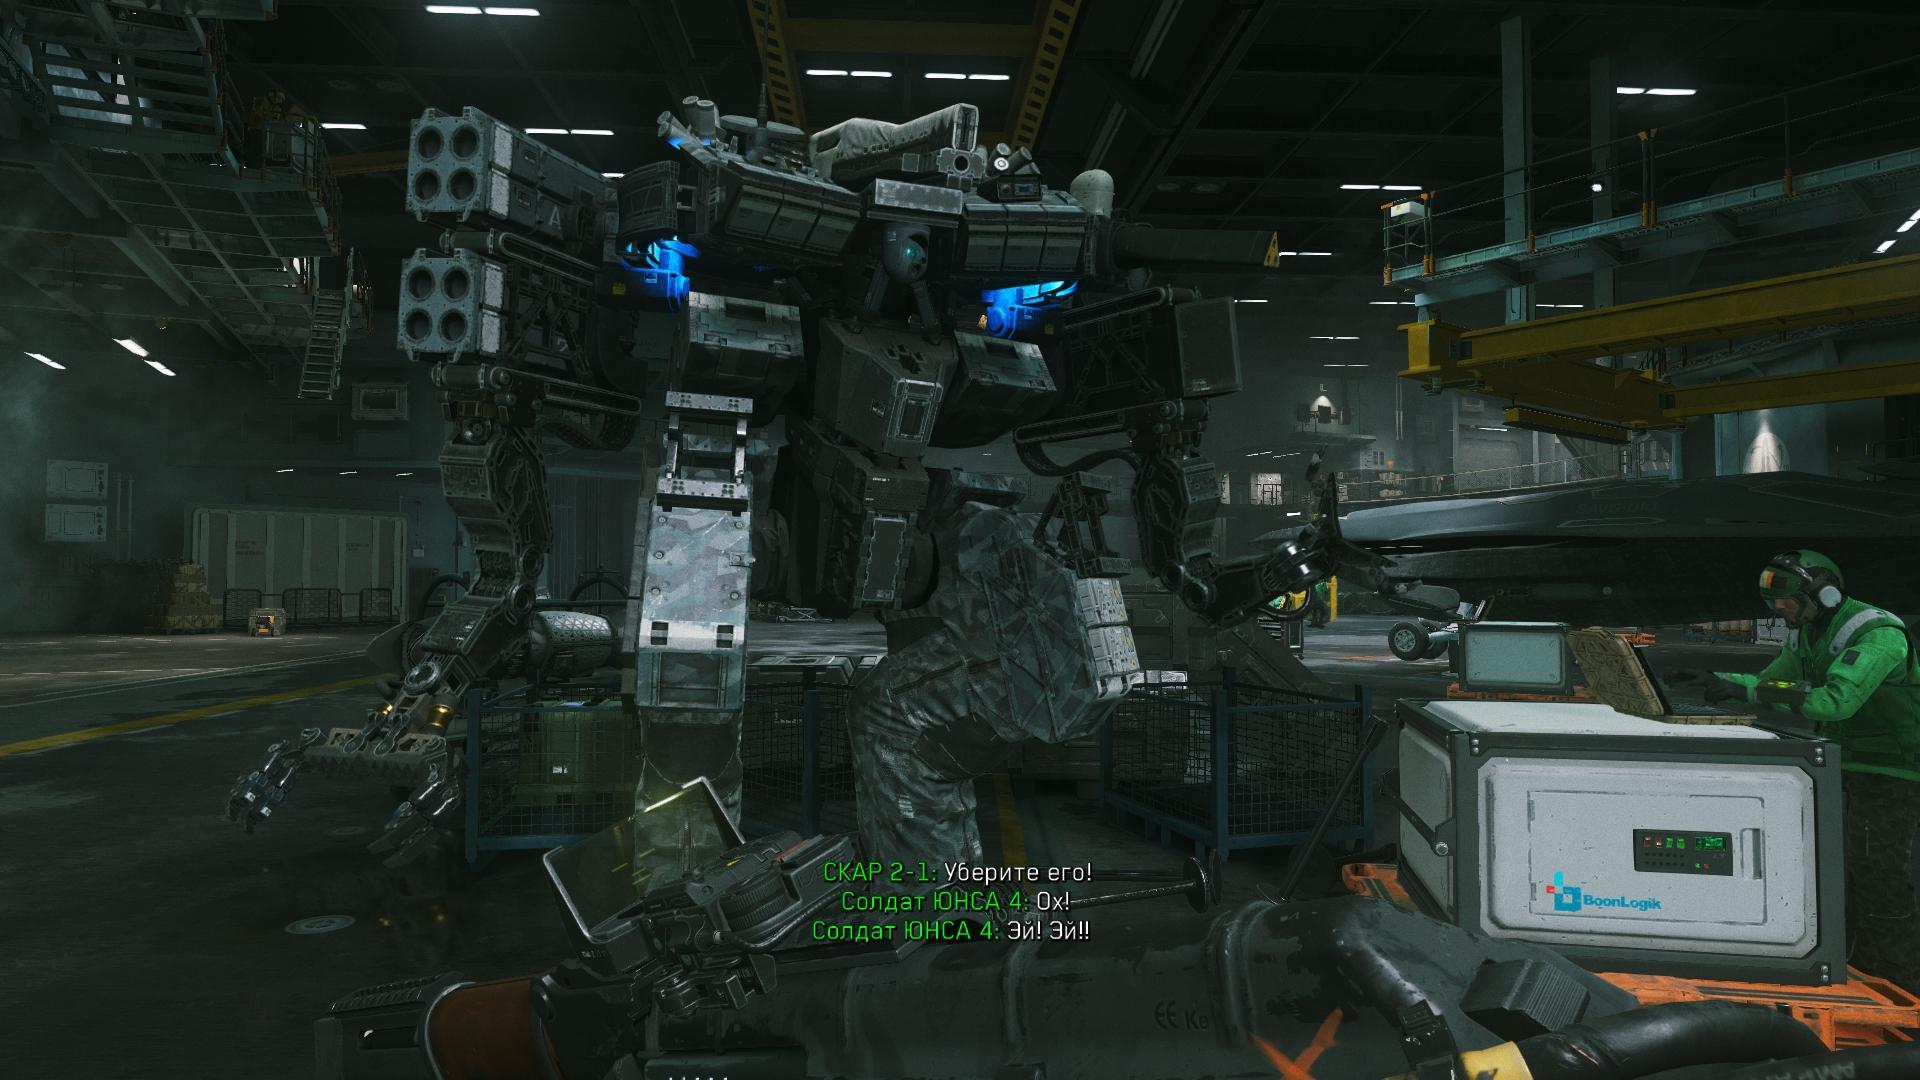 00094.Jpg - Call of Duty: Infinite Warfare